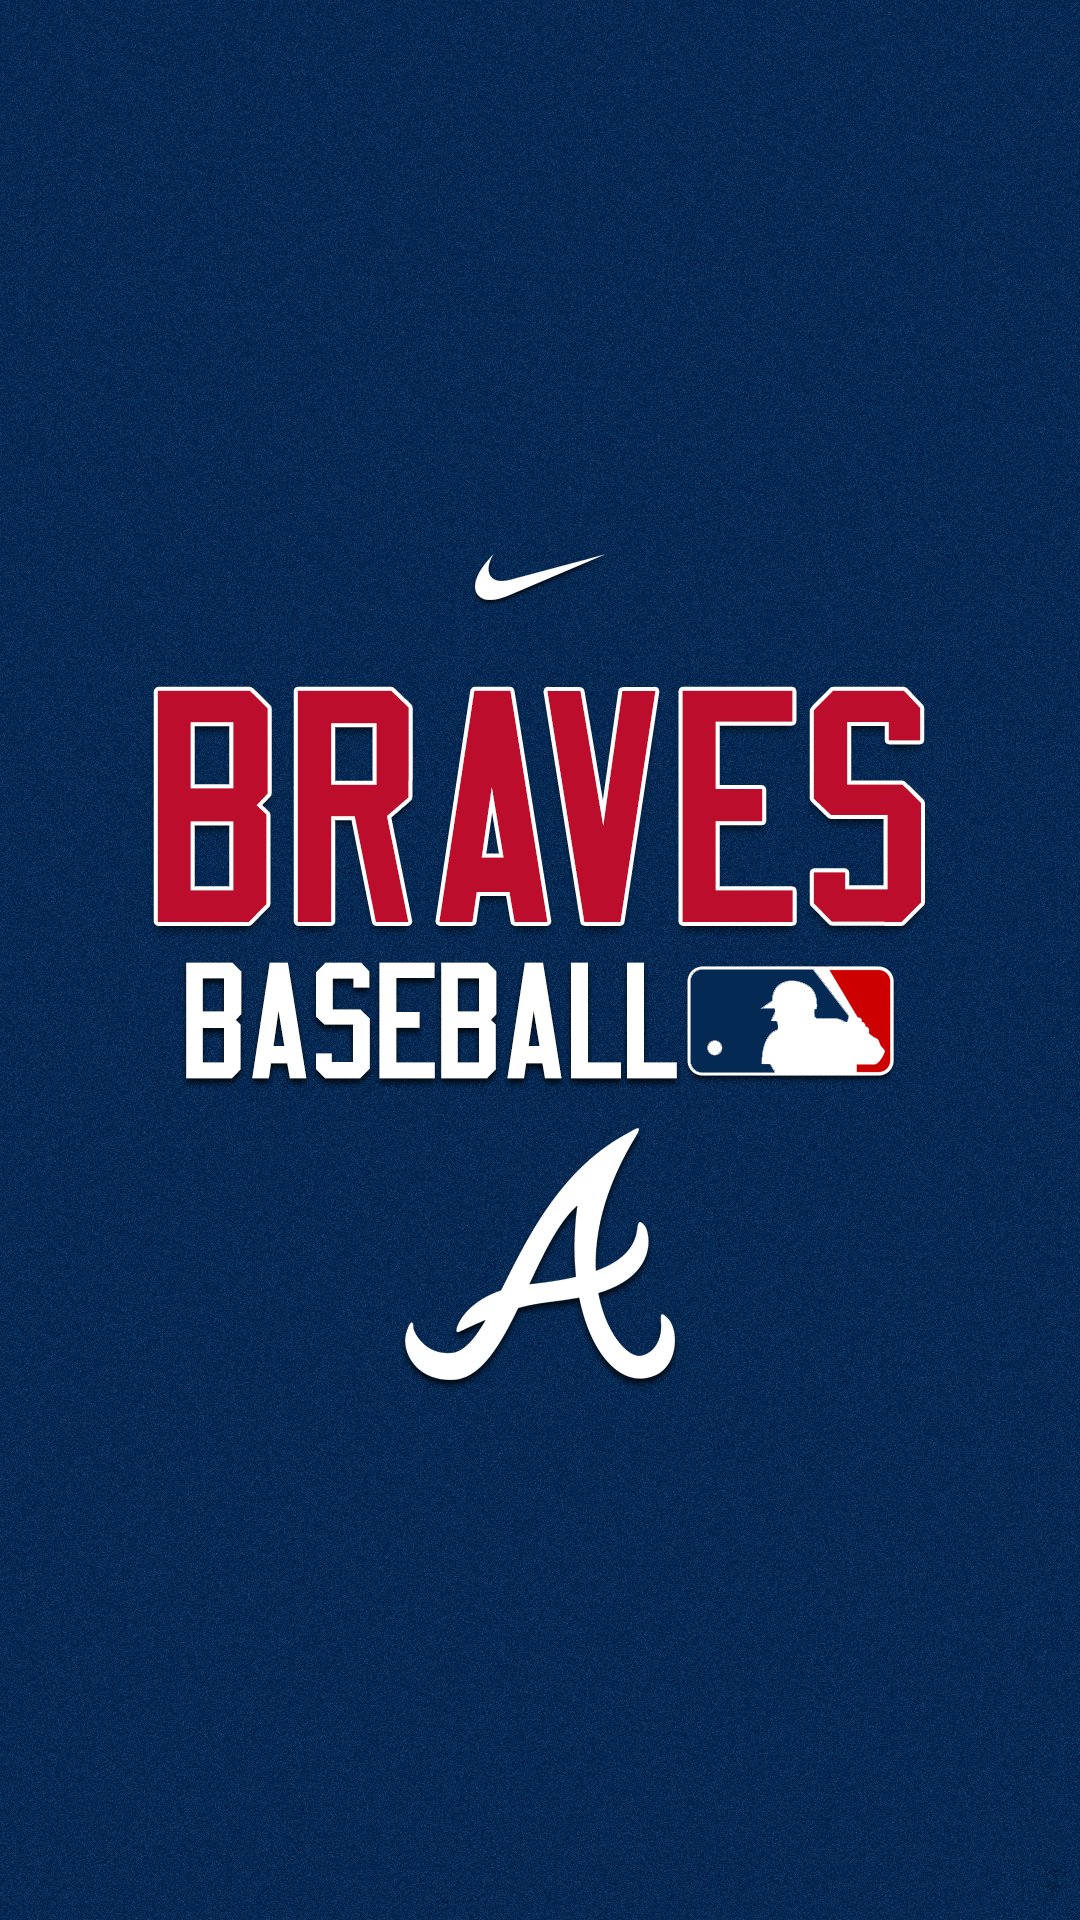 Pin By Trent Reiman On Mlb In 2020 Atlanta Braves Wallpaper Atlanta Braves Braves